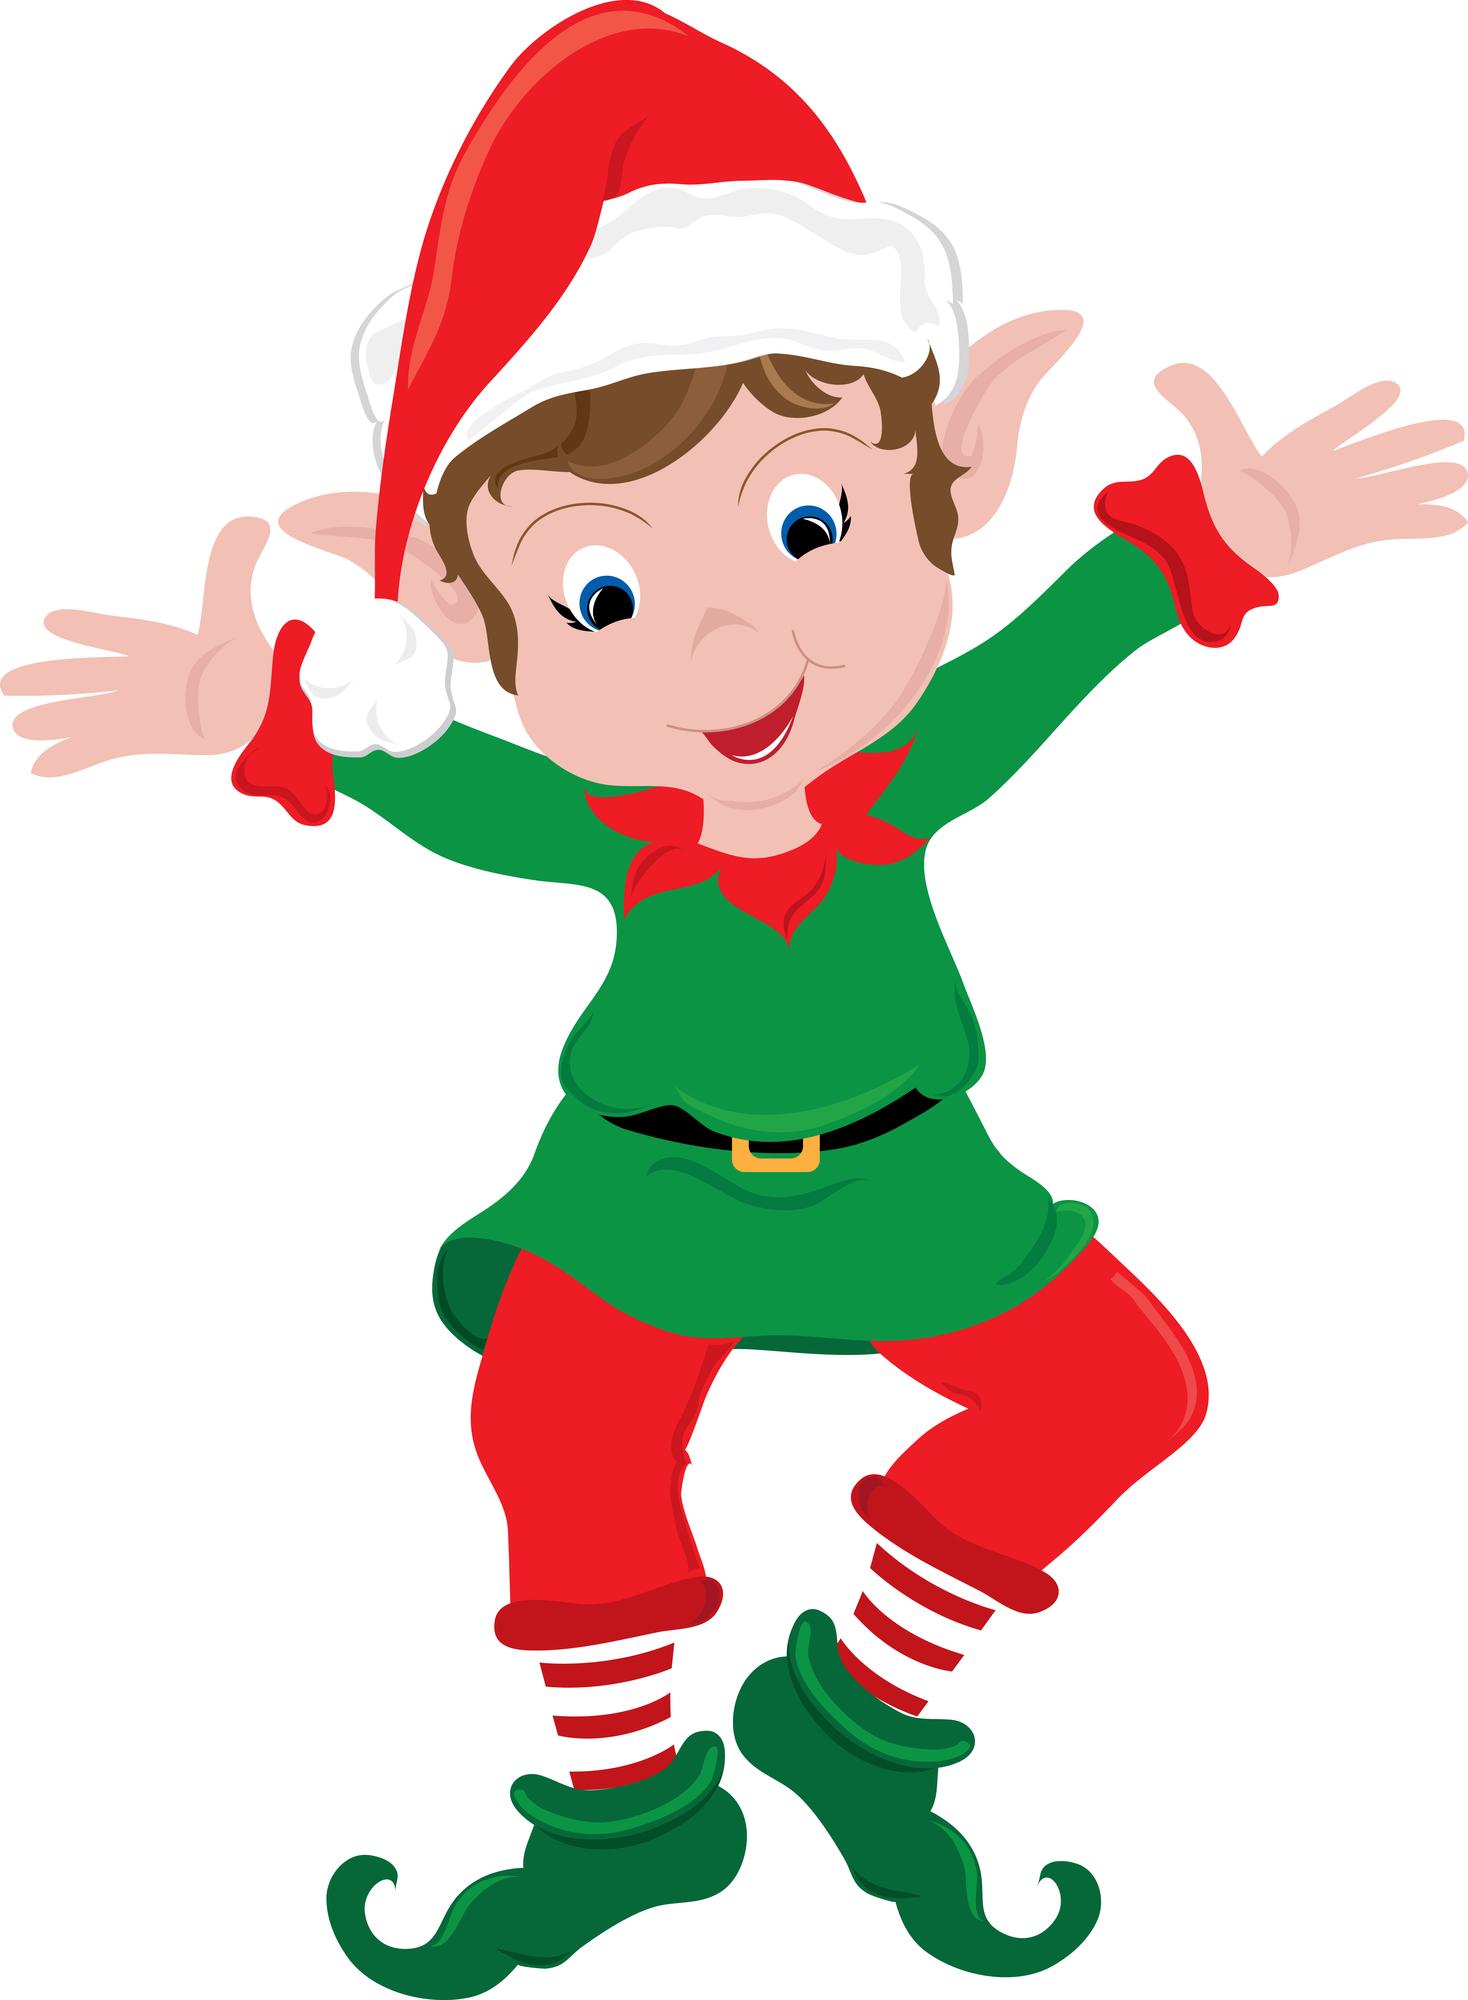 1468x2000 Elf On The Shelf Ideas Official Website Of Santa Claus